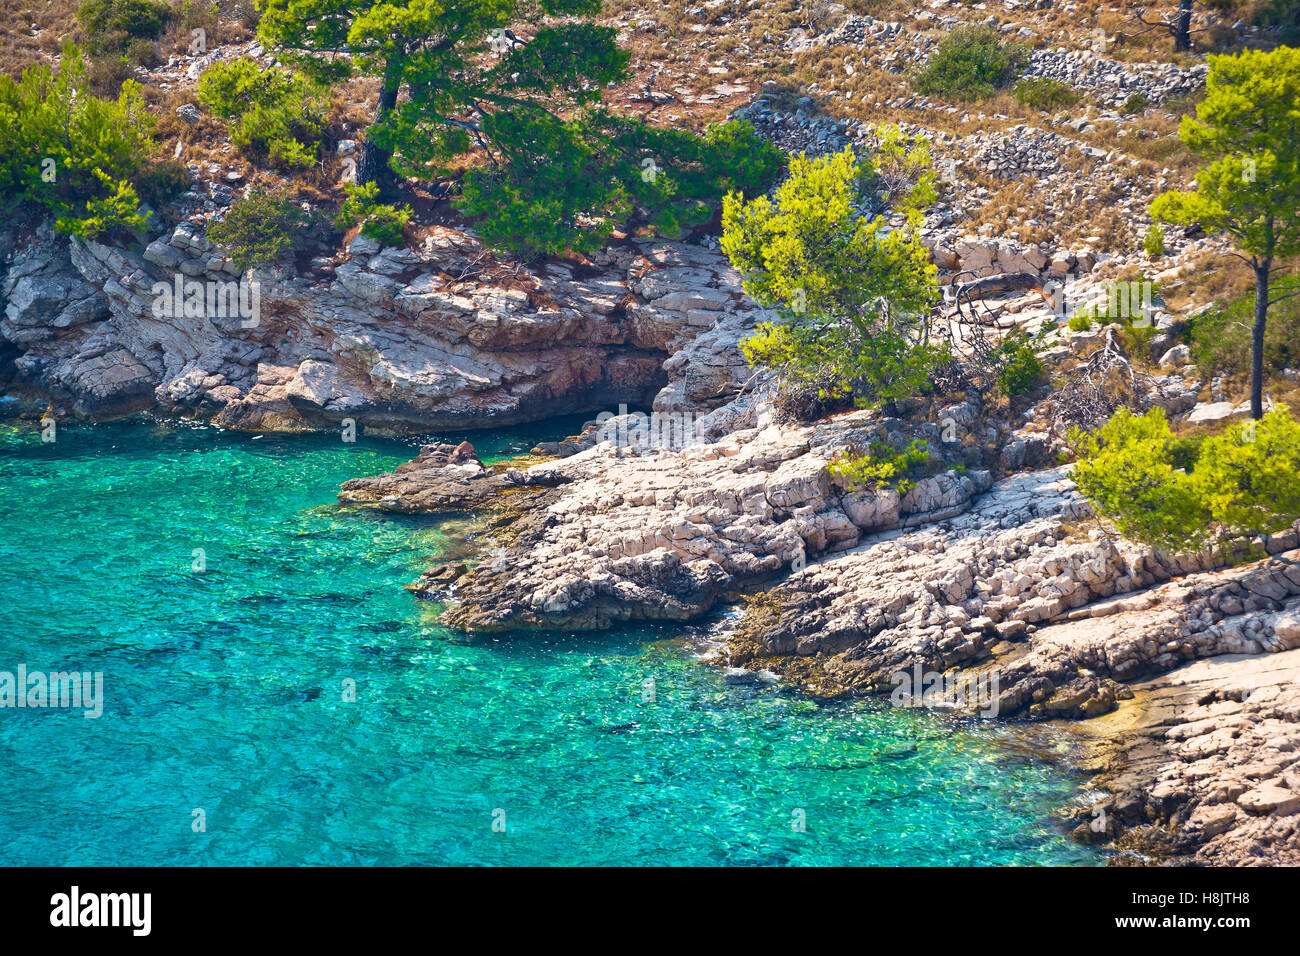 Secret turquoise beach on Brac island, Dalmatia, Croatia - Stock Image